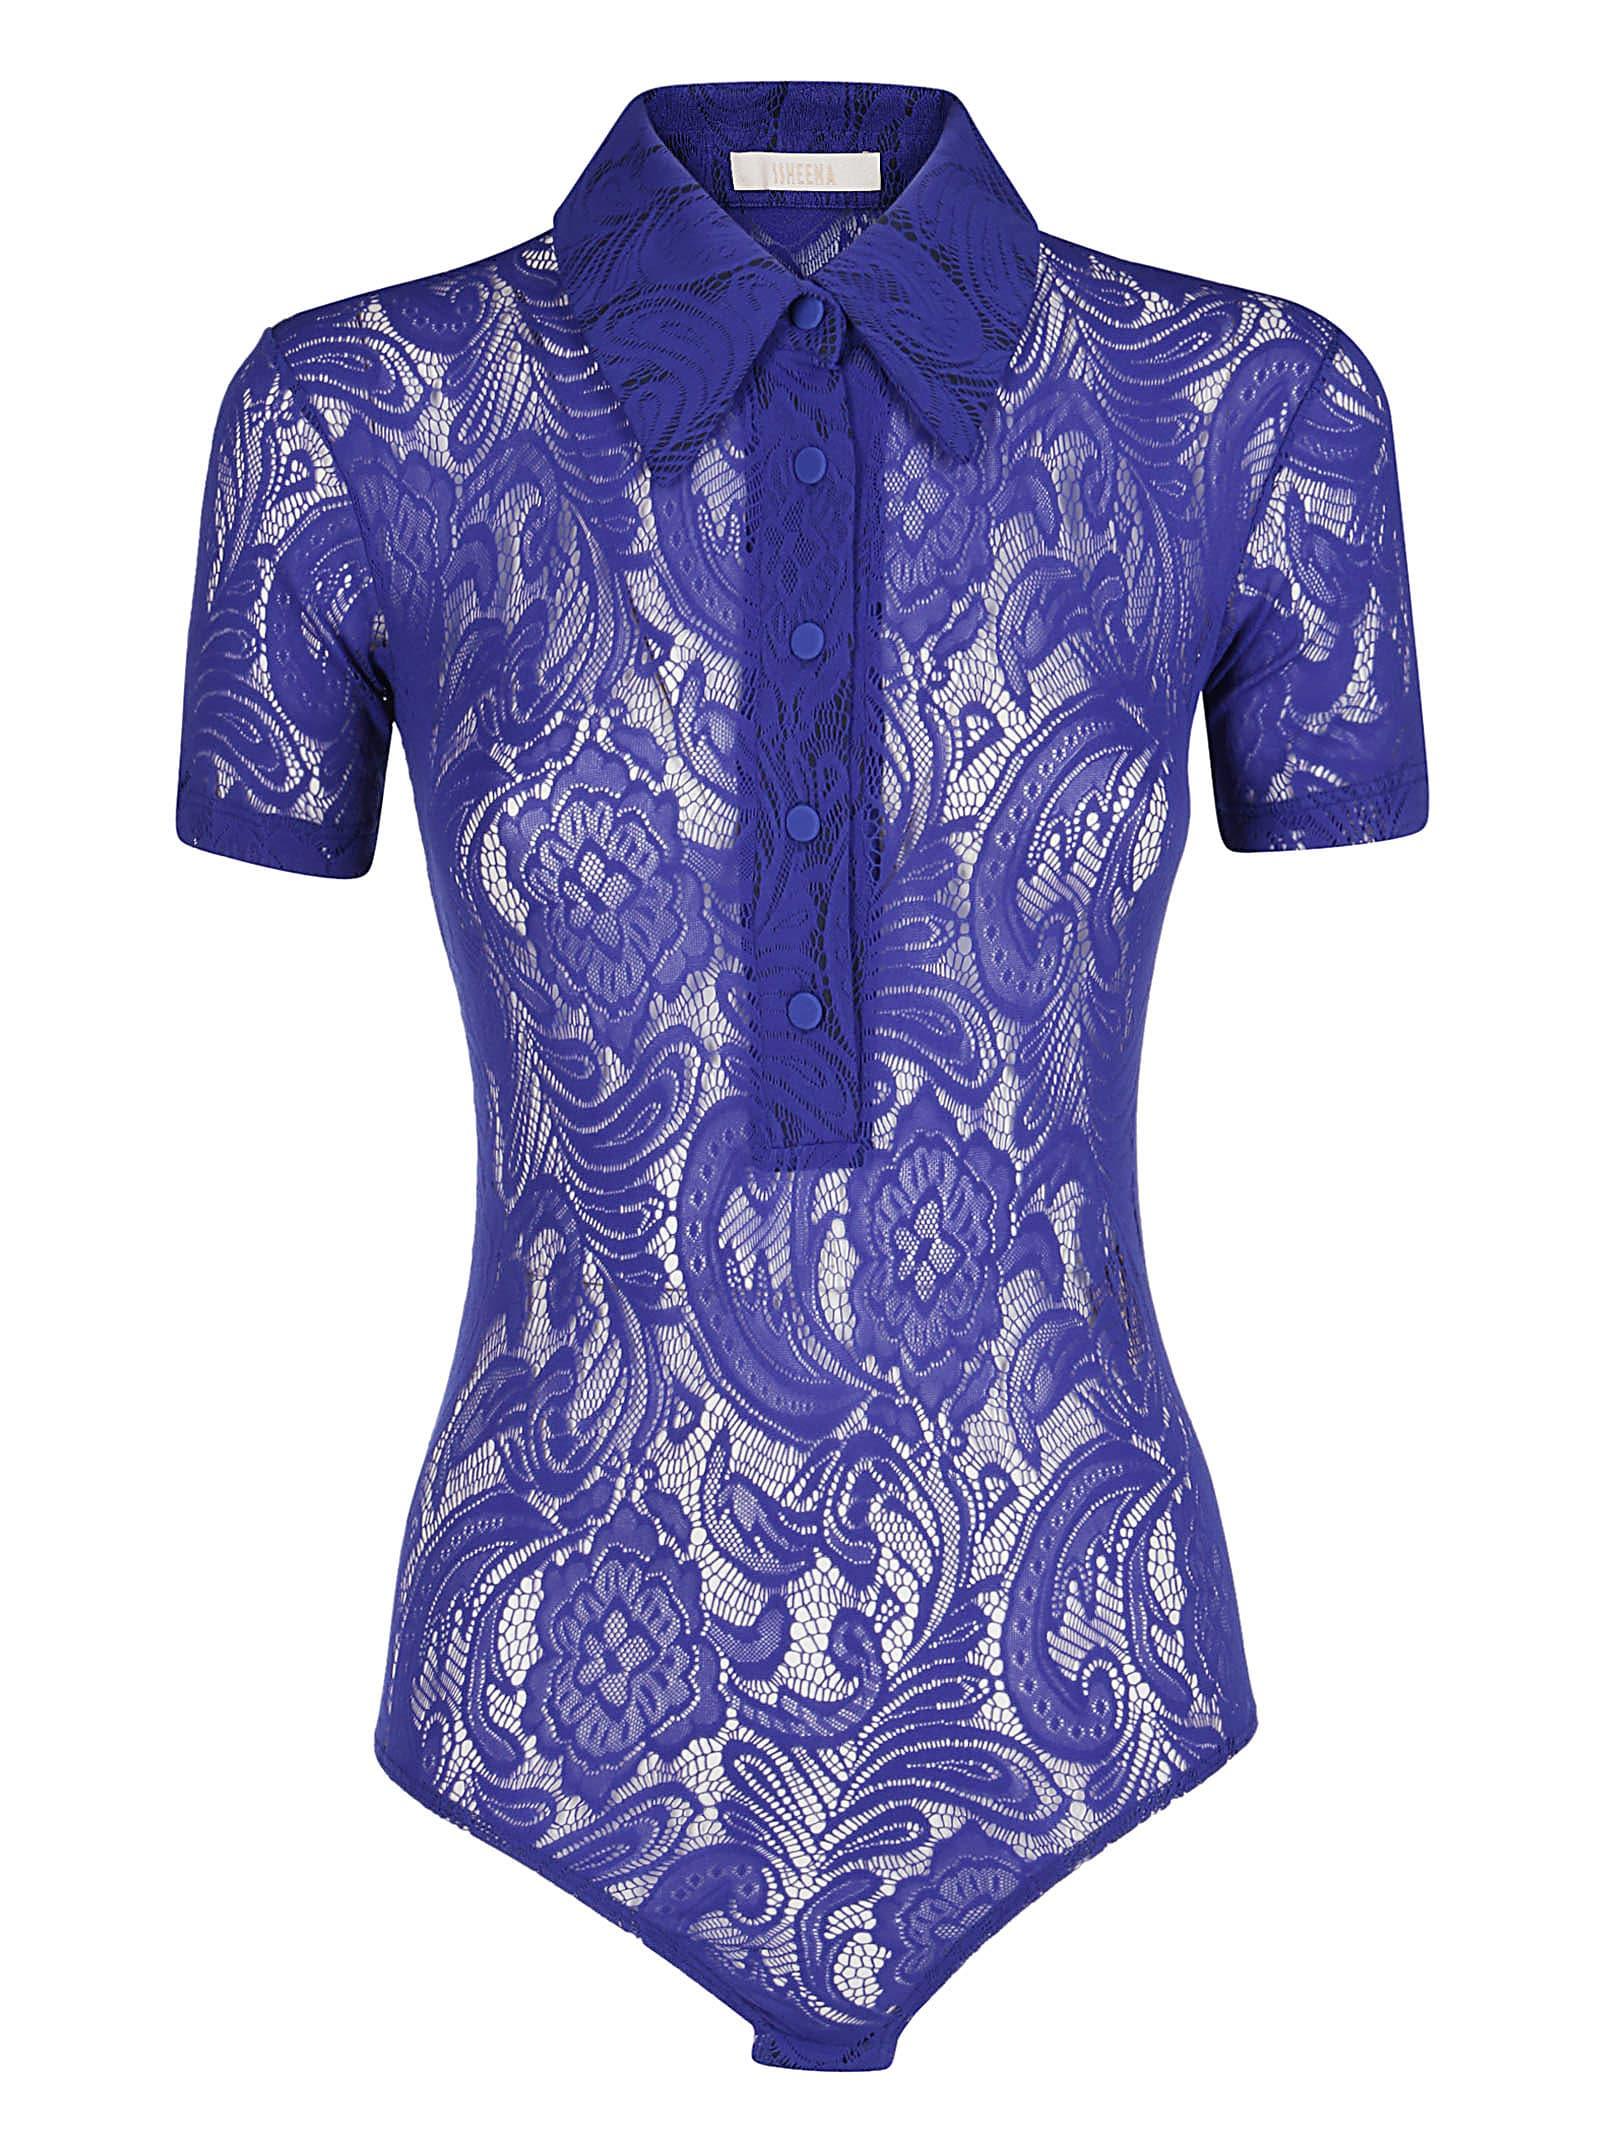 SSHEENA Electric Blue Lace Bodysuit